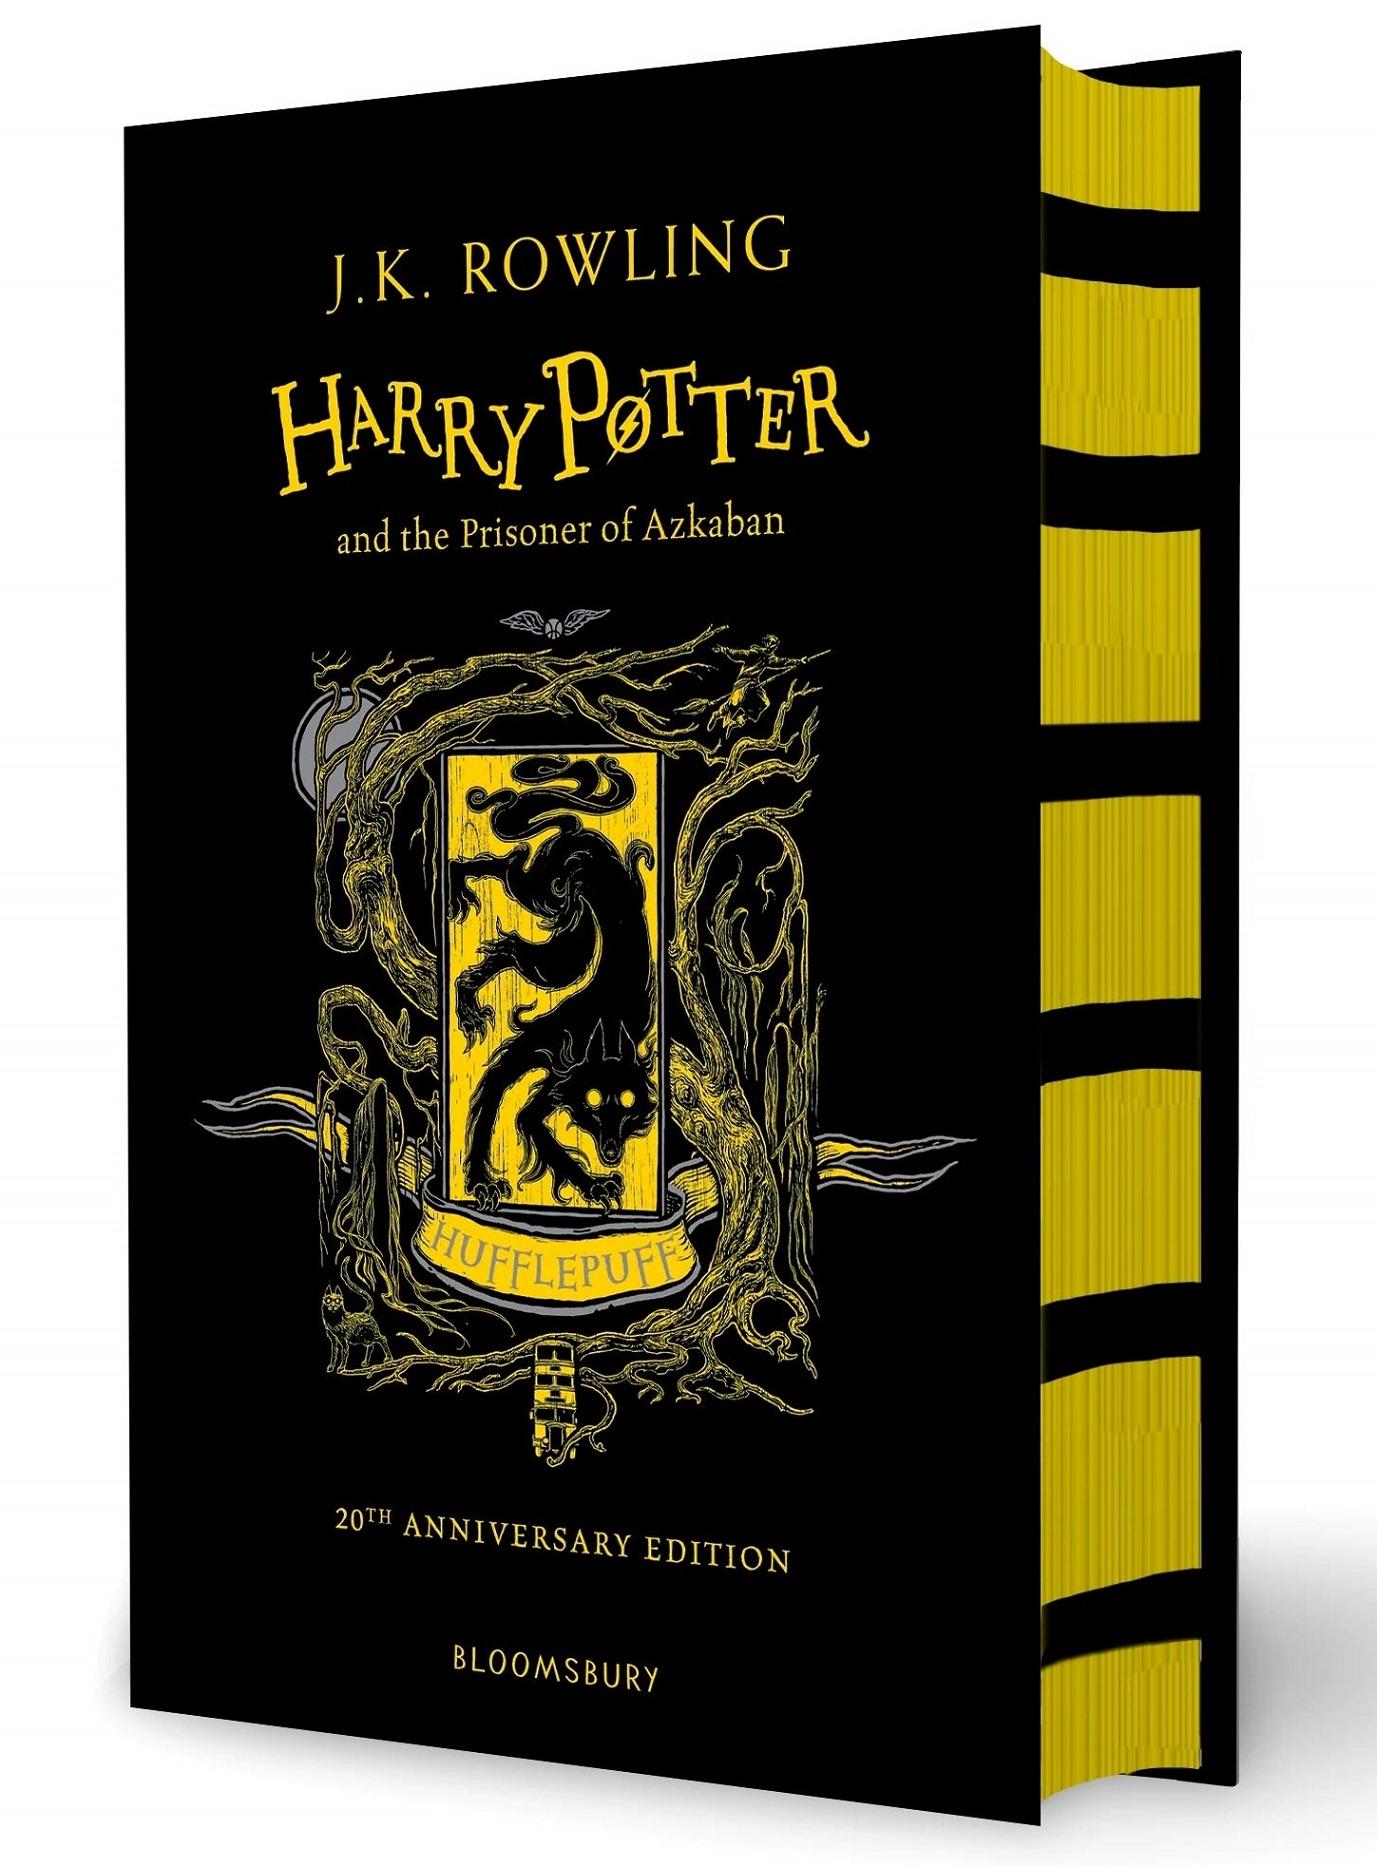 Harry Potter and the Prisoner of Azkaban: Hufflepuff Edition